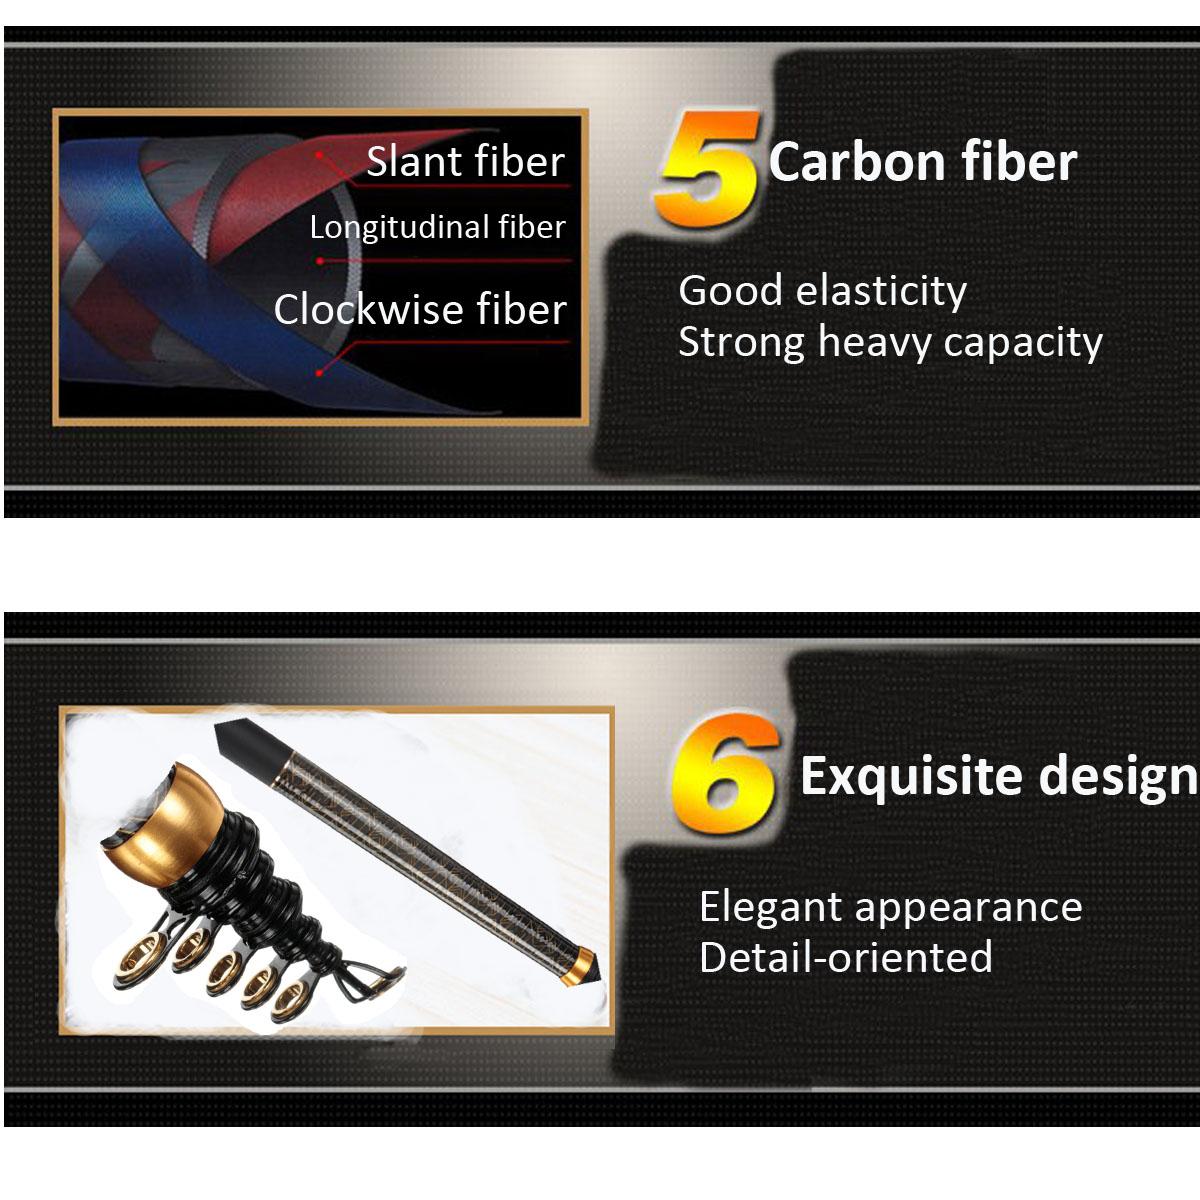 Harga Spesifikasi 5.4mCarbon Fiber Telescopic Spinning Casting Pole Saltwater Sea Fishing Rod Terbaru - Cek